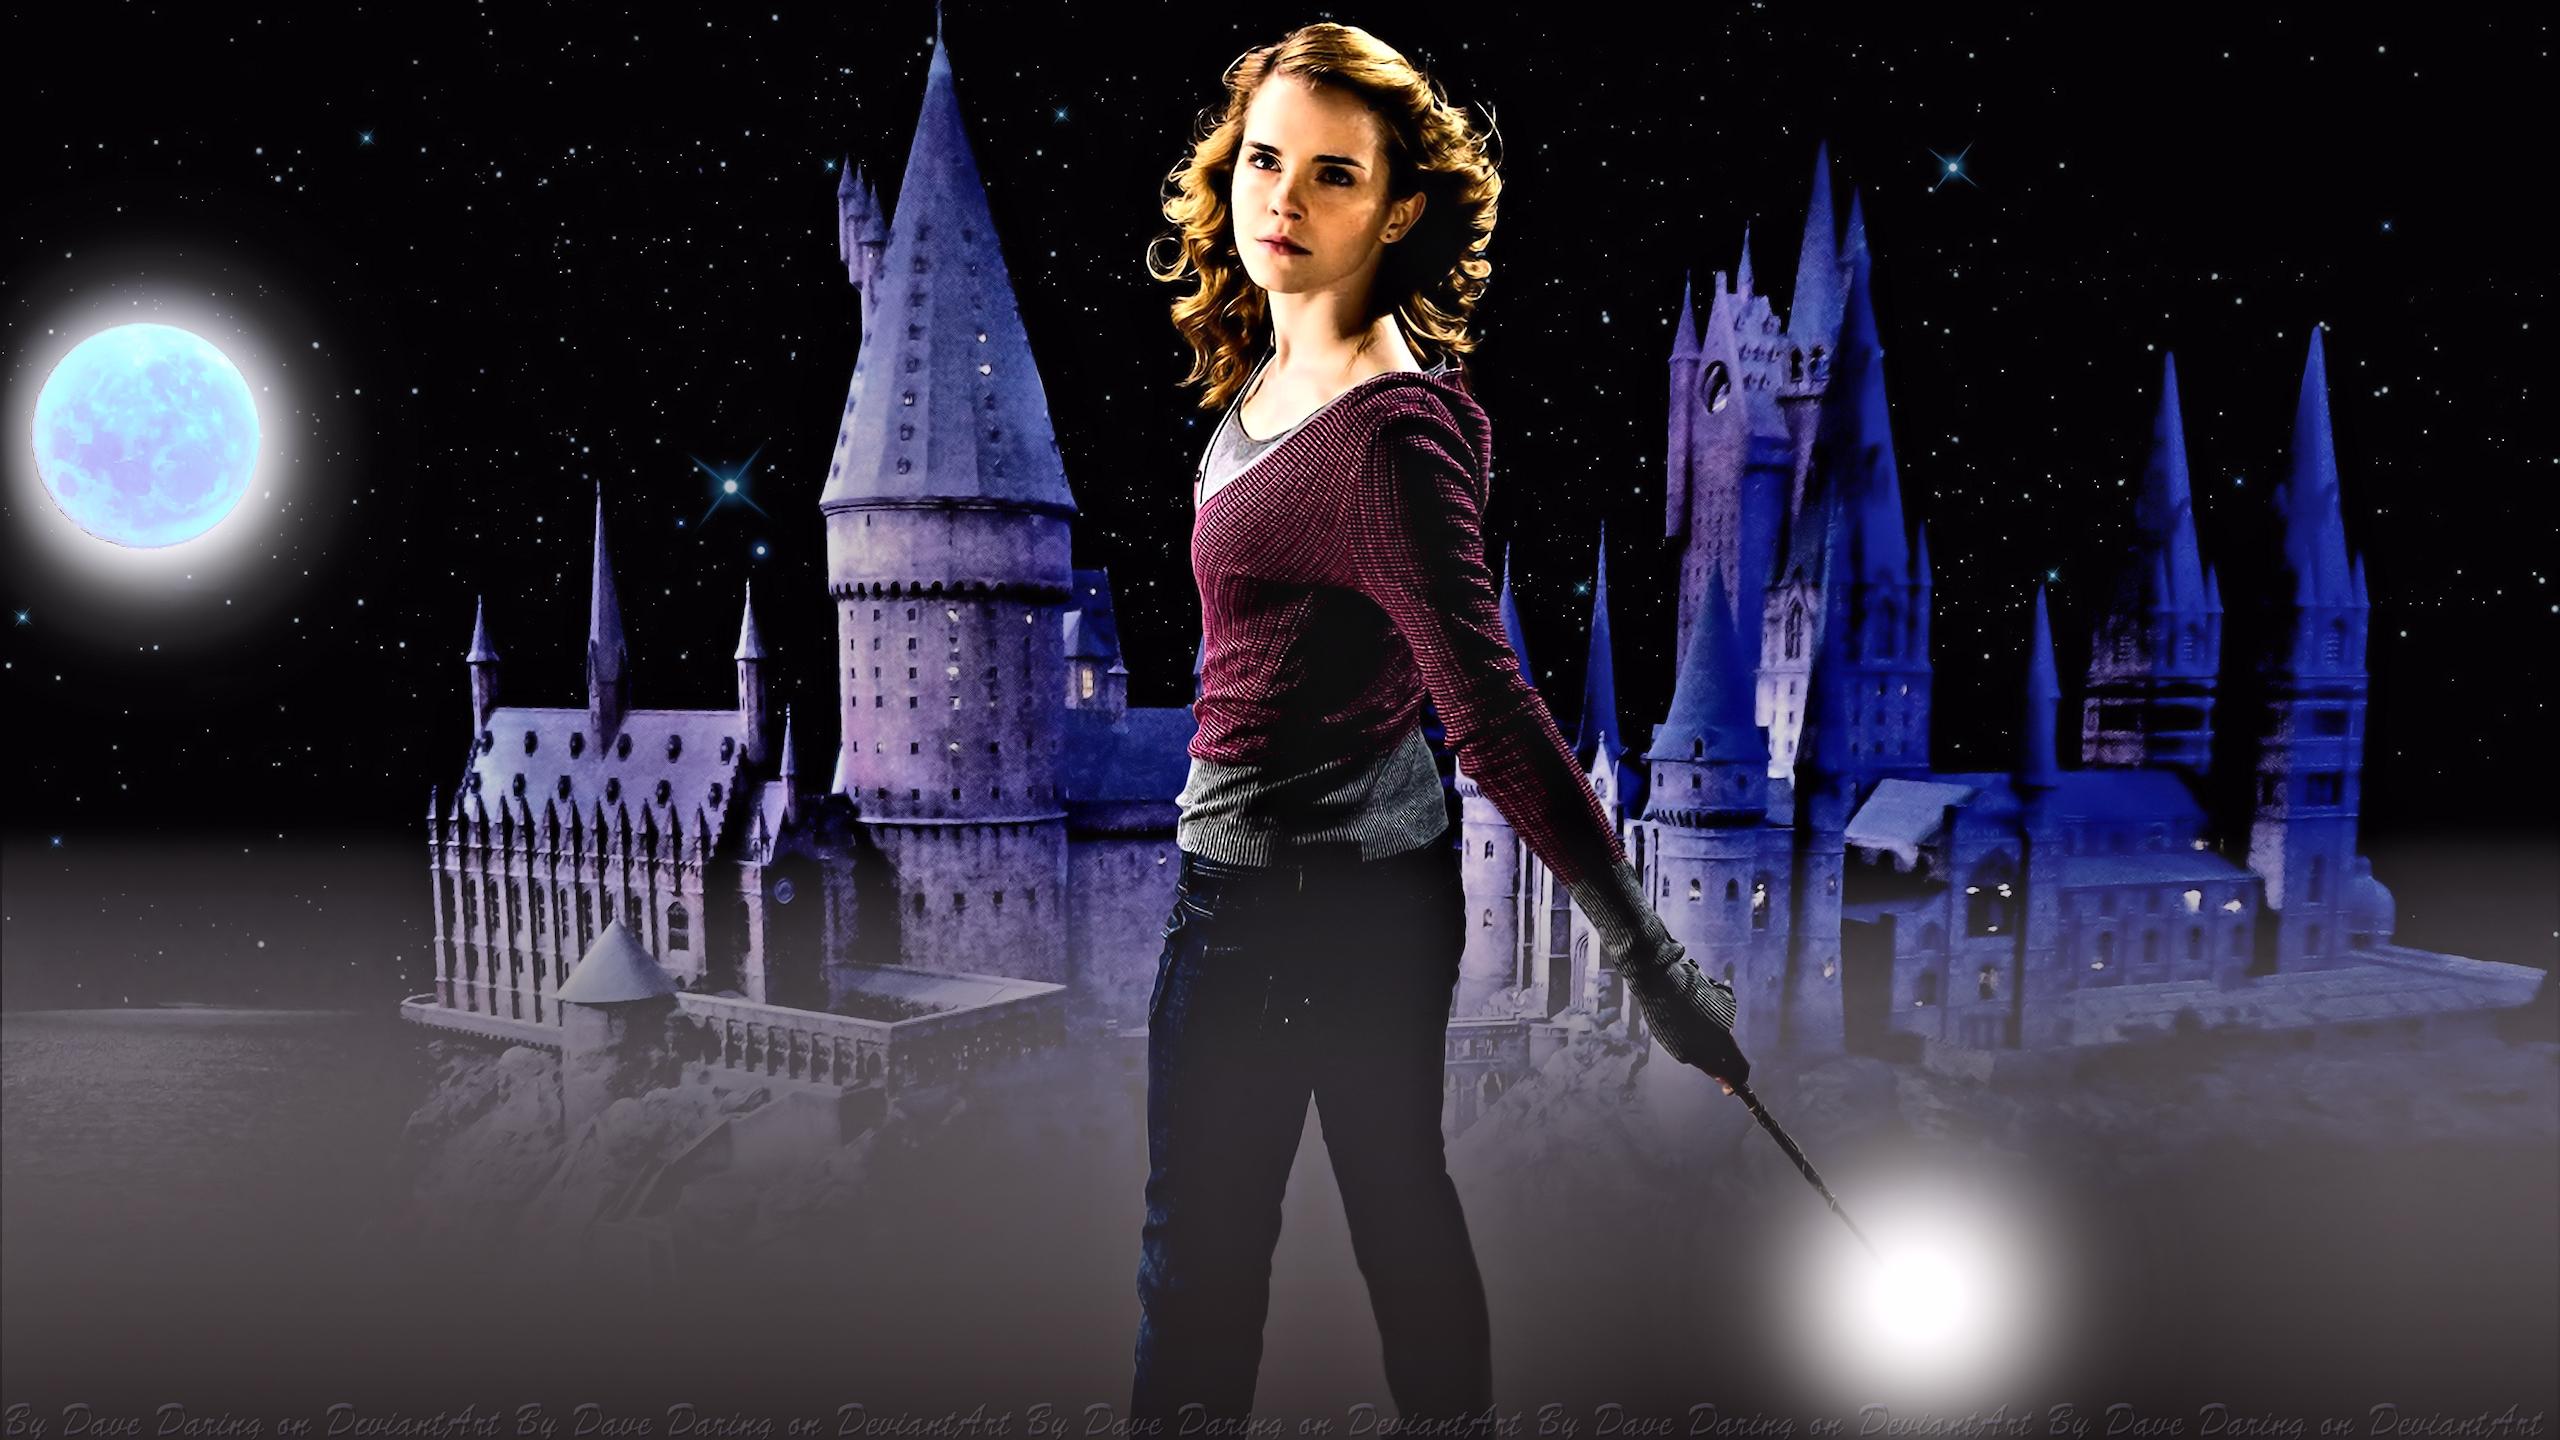 Emma Watson Hogwarts Defender IV by Dave-Daring